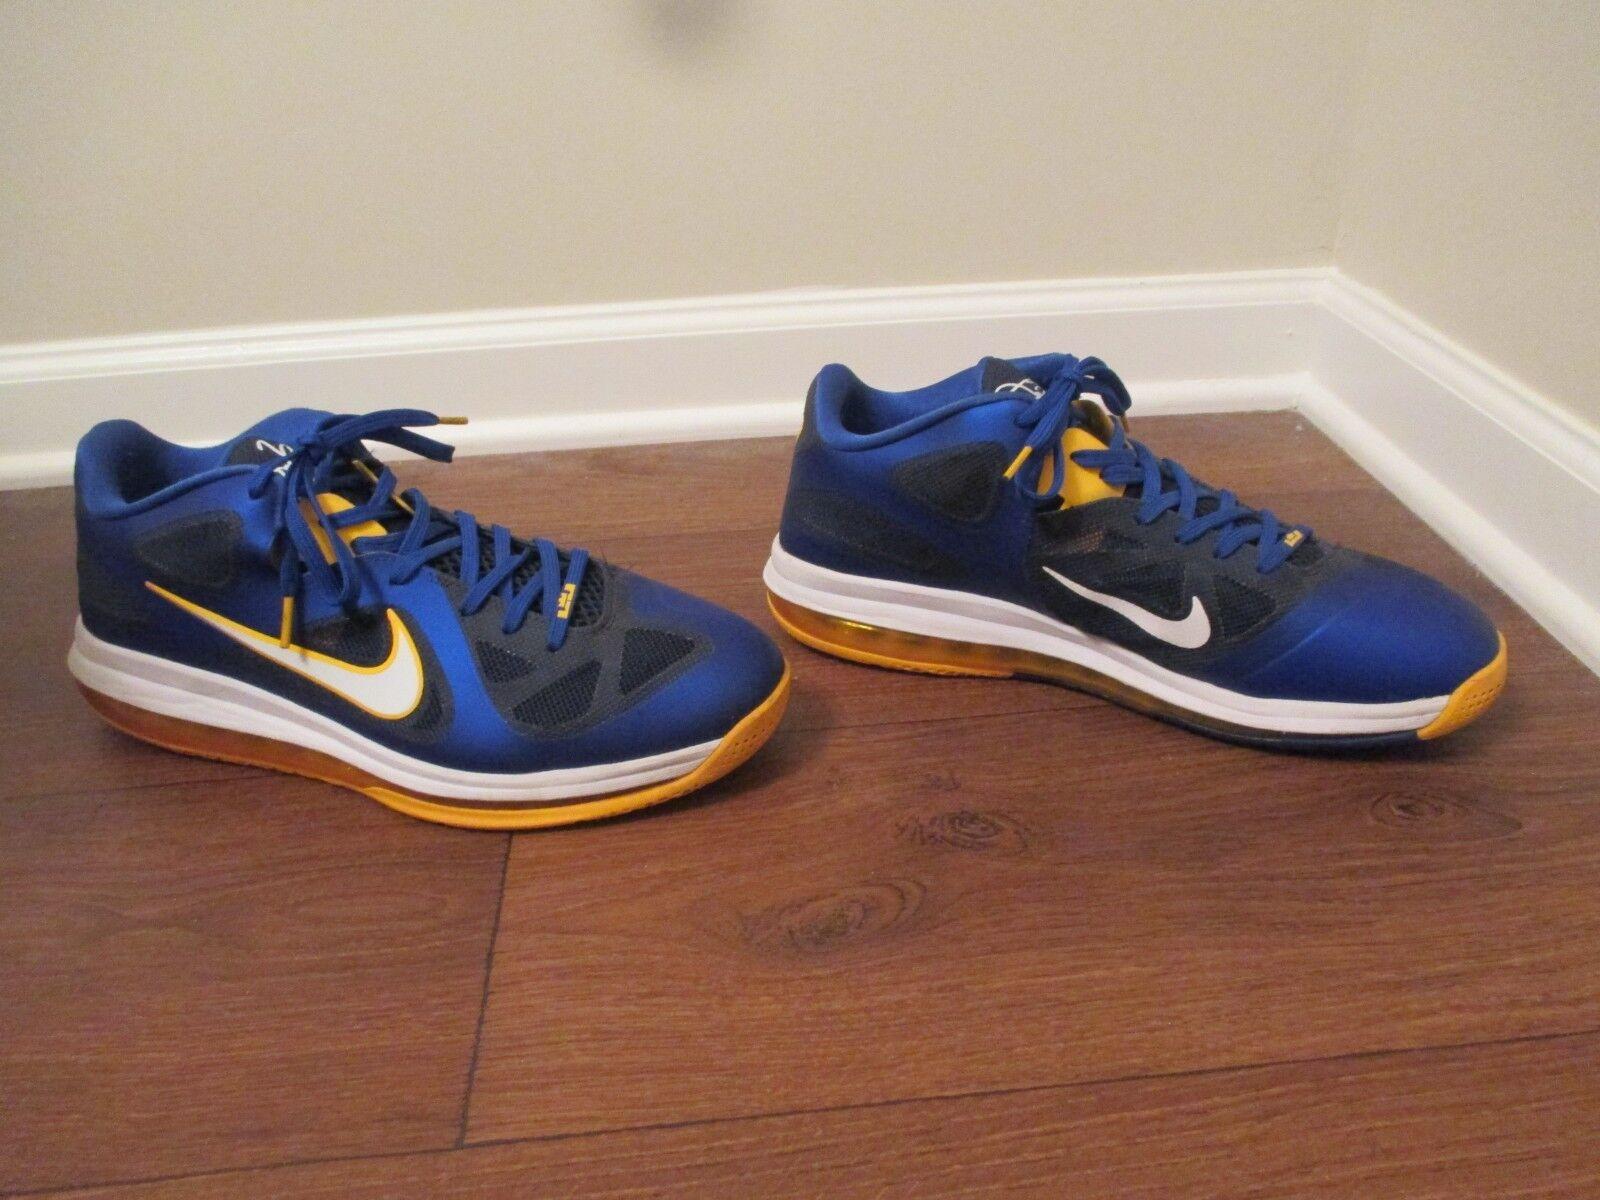 Utilizzato Dimensione Word 13 Nike LeBron IX  9 Bassa Entourage Scarpe Royal oro Navy bianca  n ° 1 online